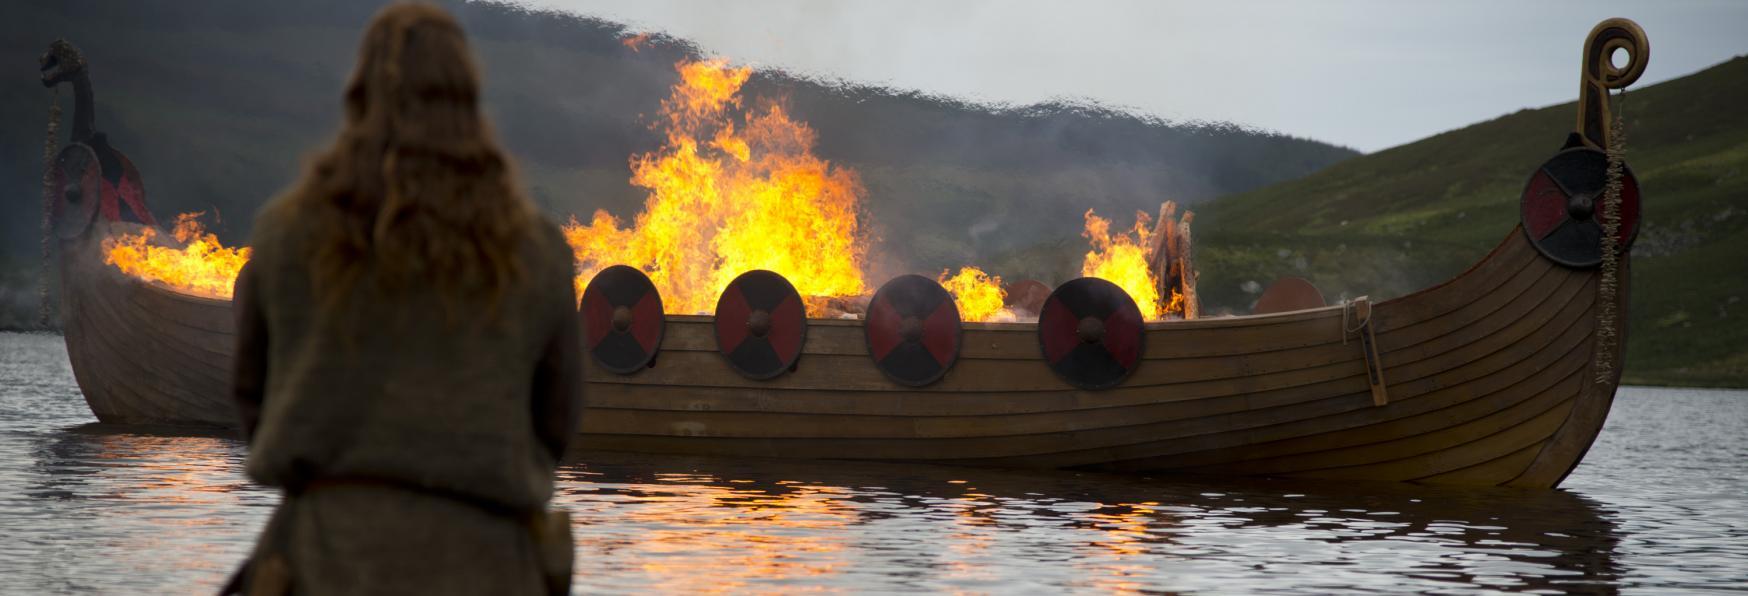 Vikings: Valhalla - A che punto è la Serie TV Spin-off targata Netflix?